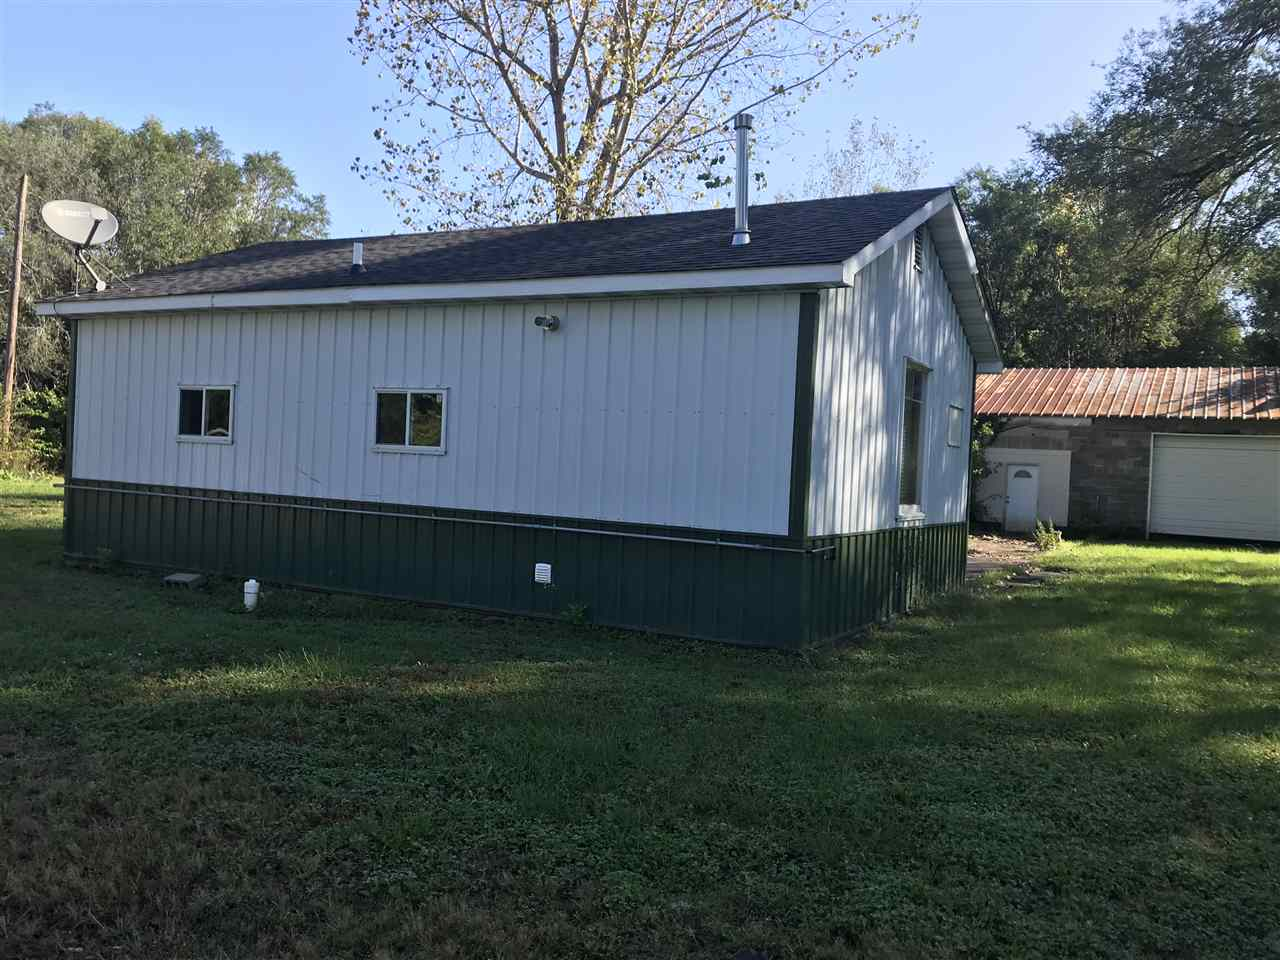 403-405 JACKSON Property Photo - Hillsdale, IL real estate listing